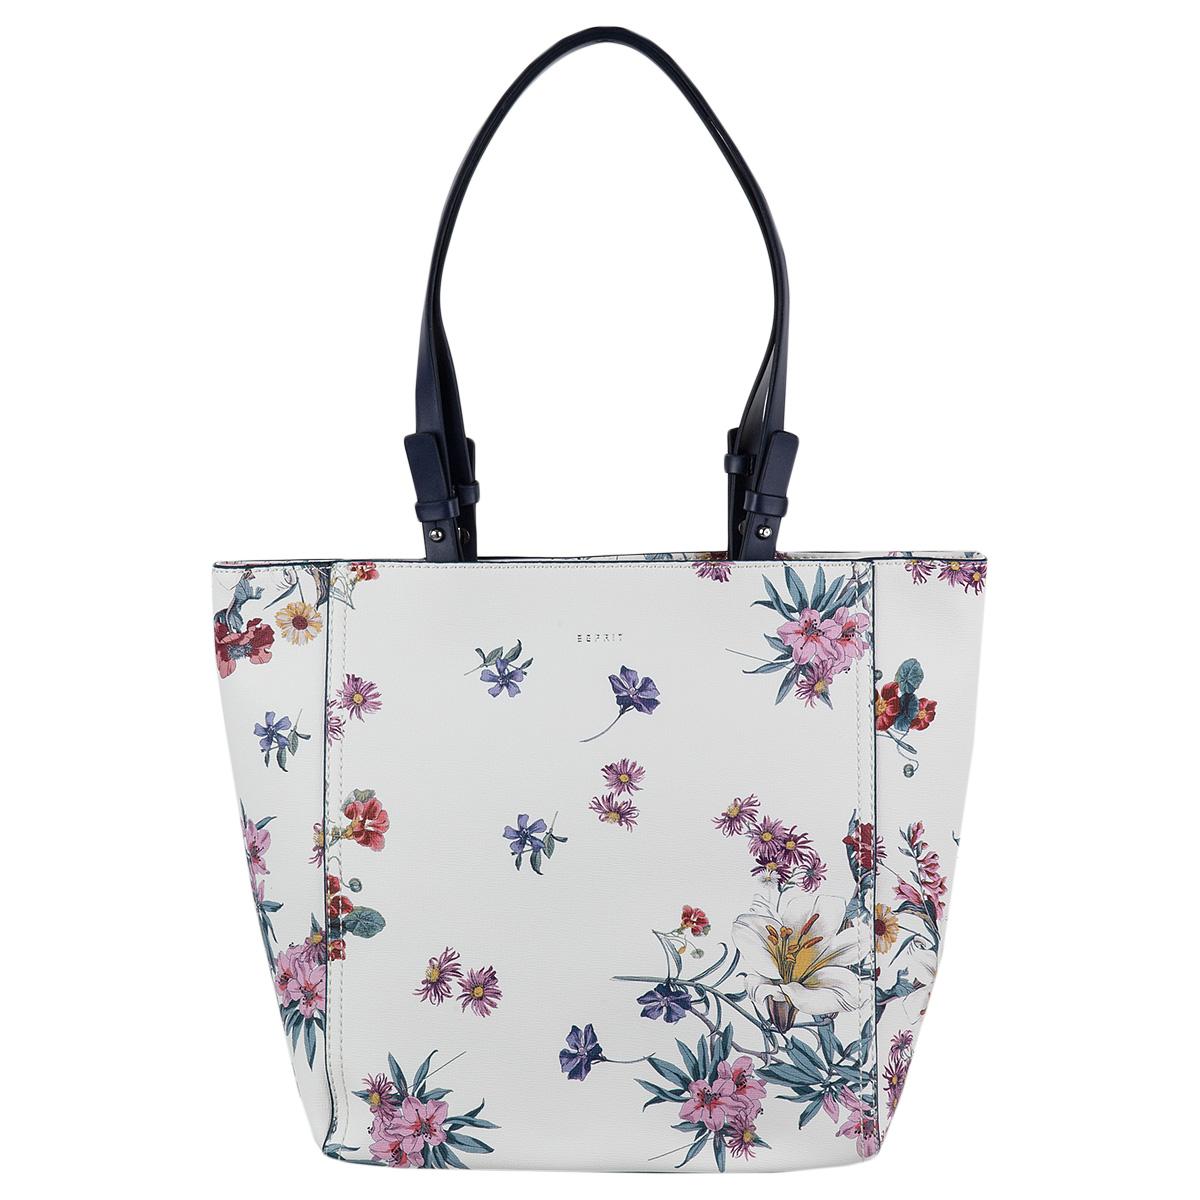 Esprit Fay Shopper Handtasche Schultertasche Henkeltasche 068EA1O023-430